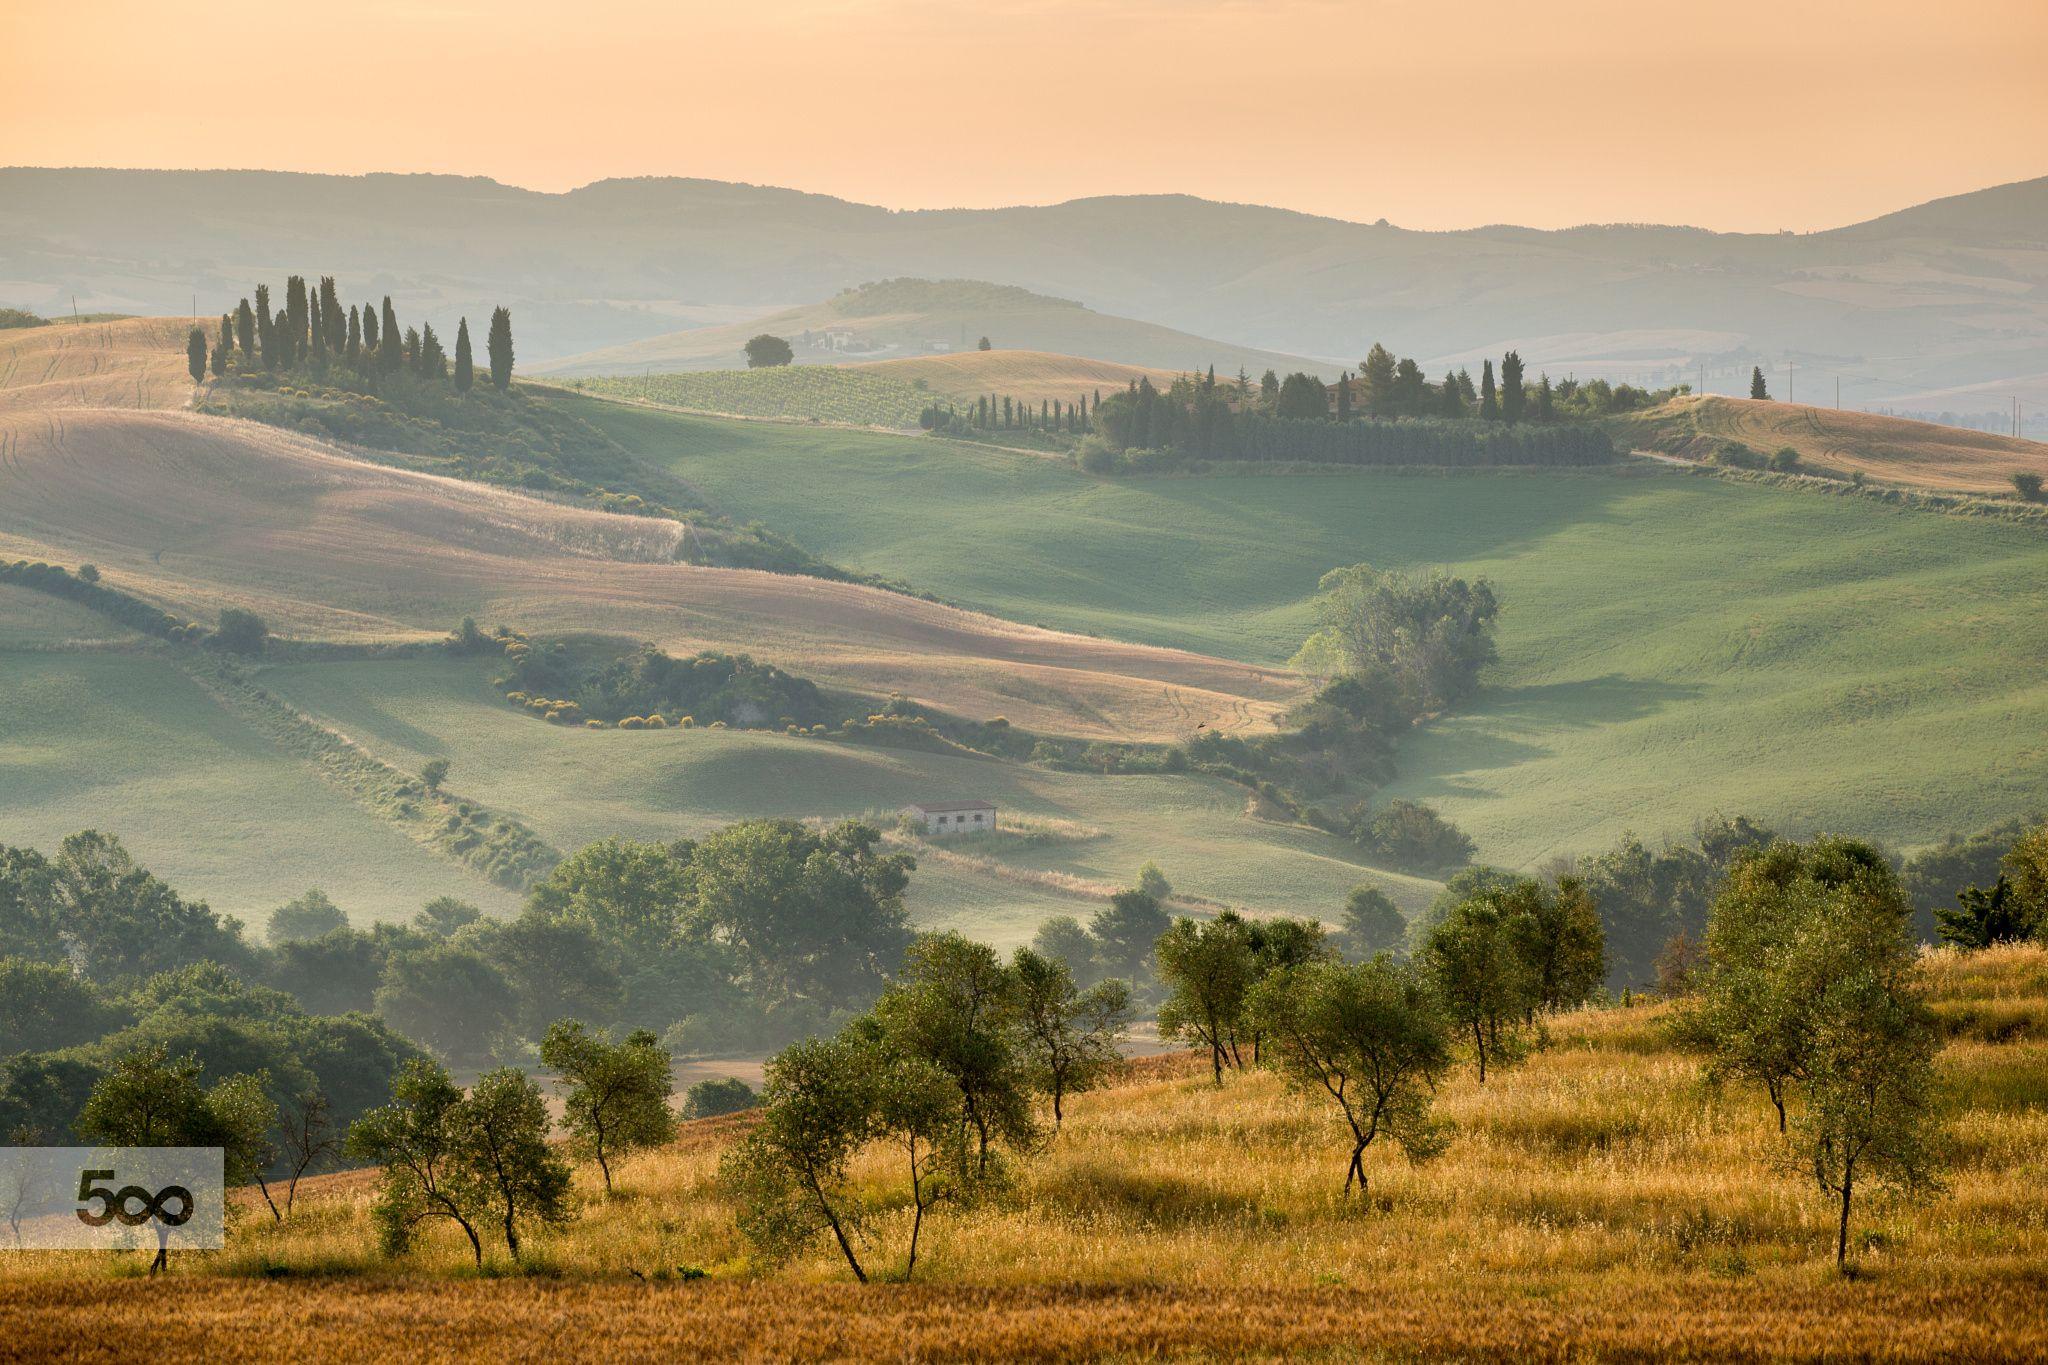 Svegliarsi in Toscana by Francesco Riccardo Iacomino on 500px